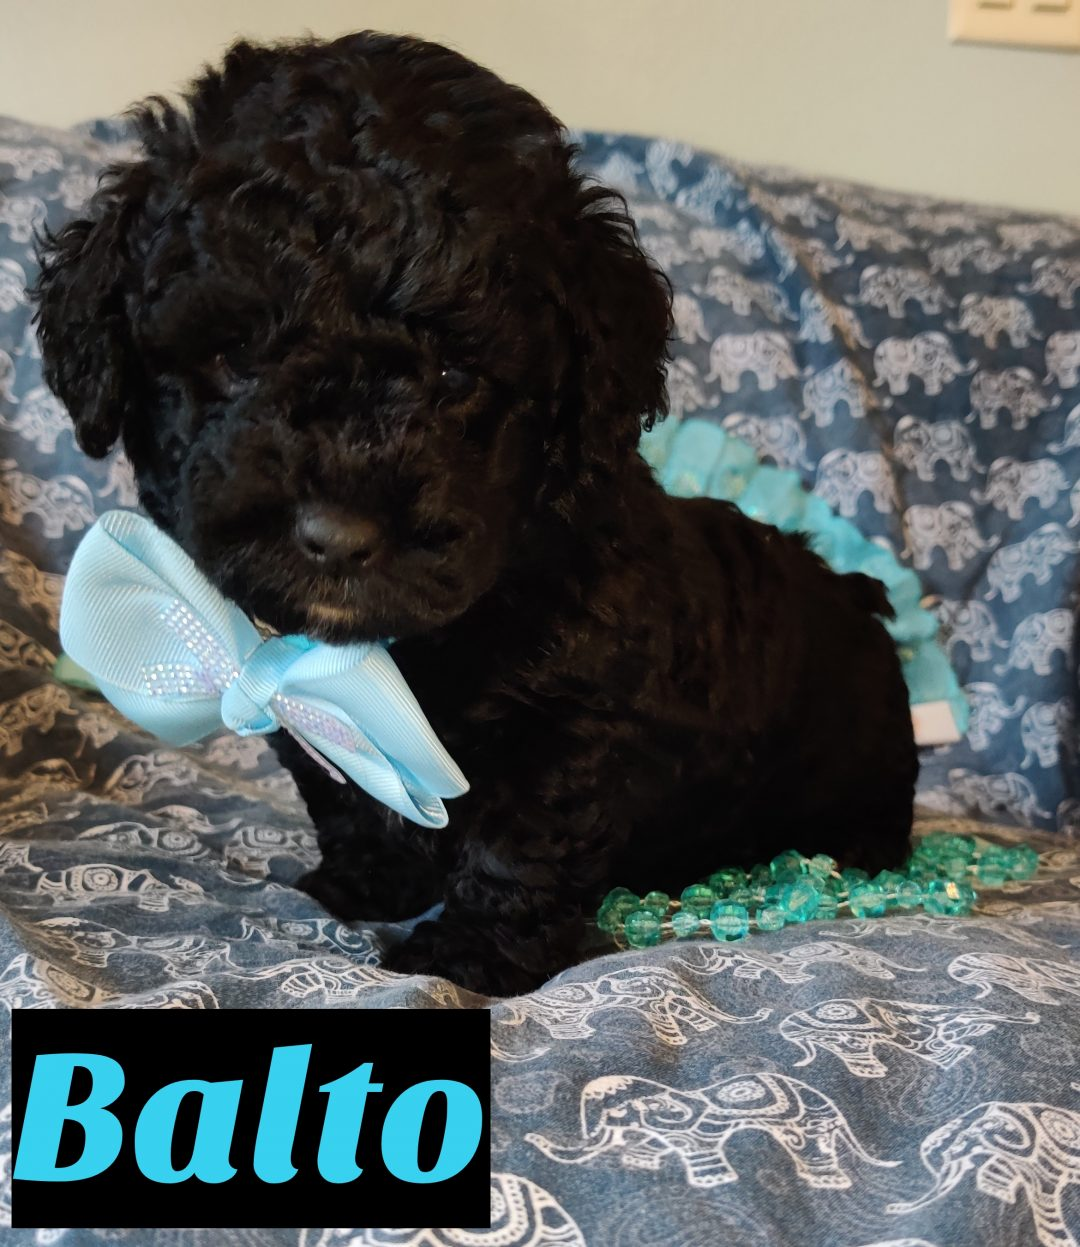 Balto Mini Goldendoodle Pupper For Sale In Saint Cloud Florida